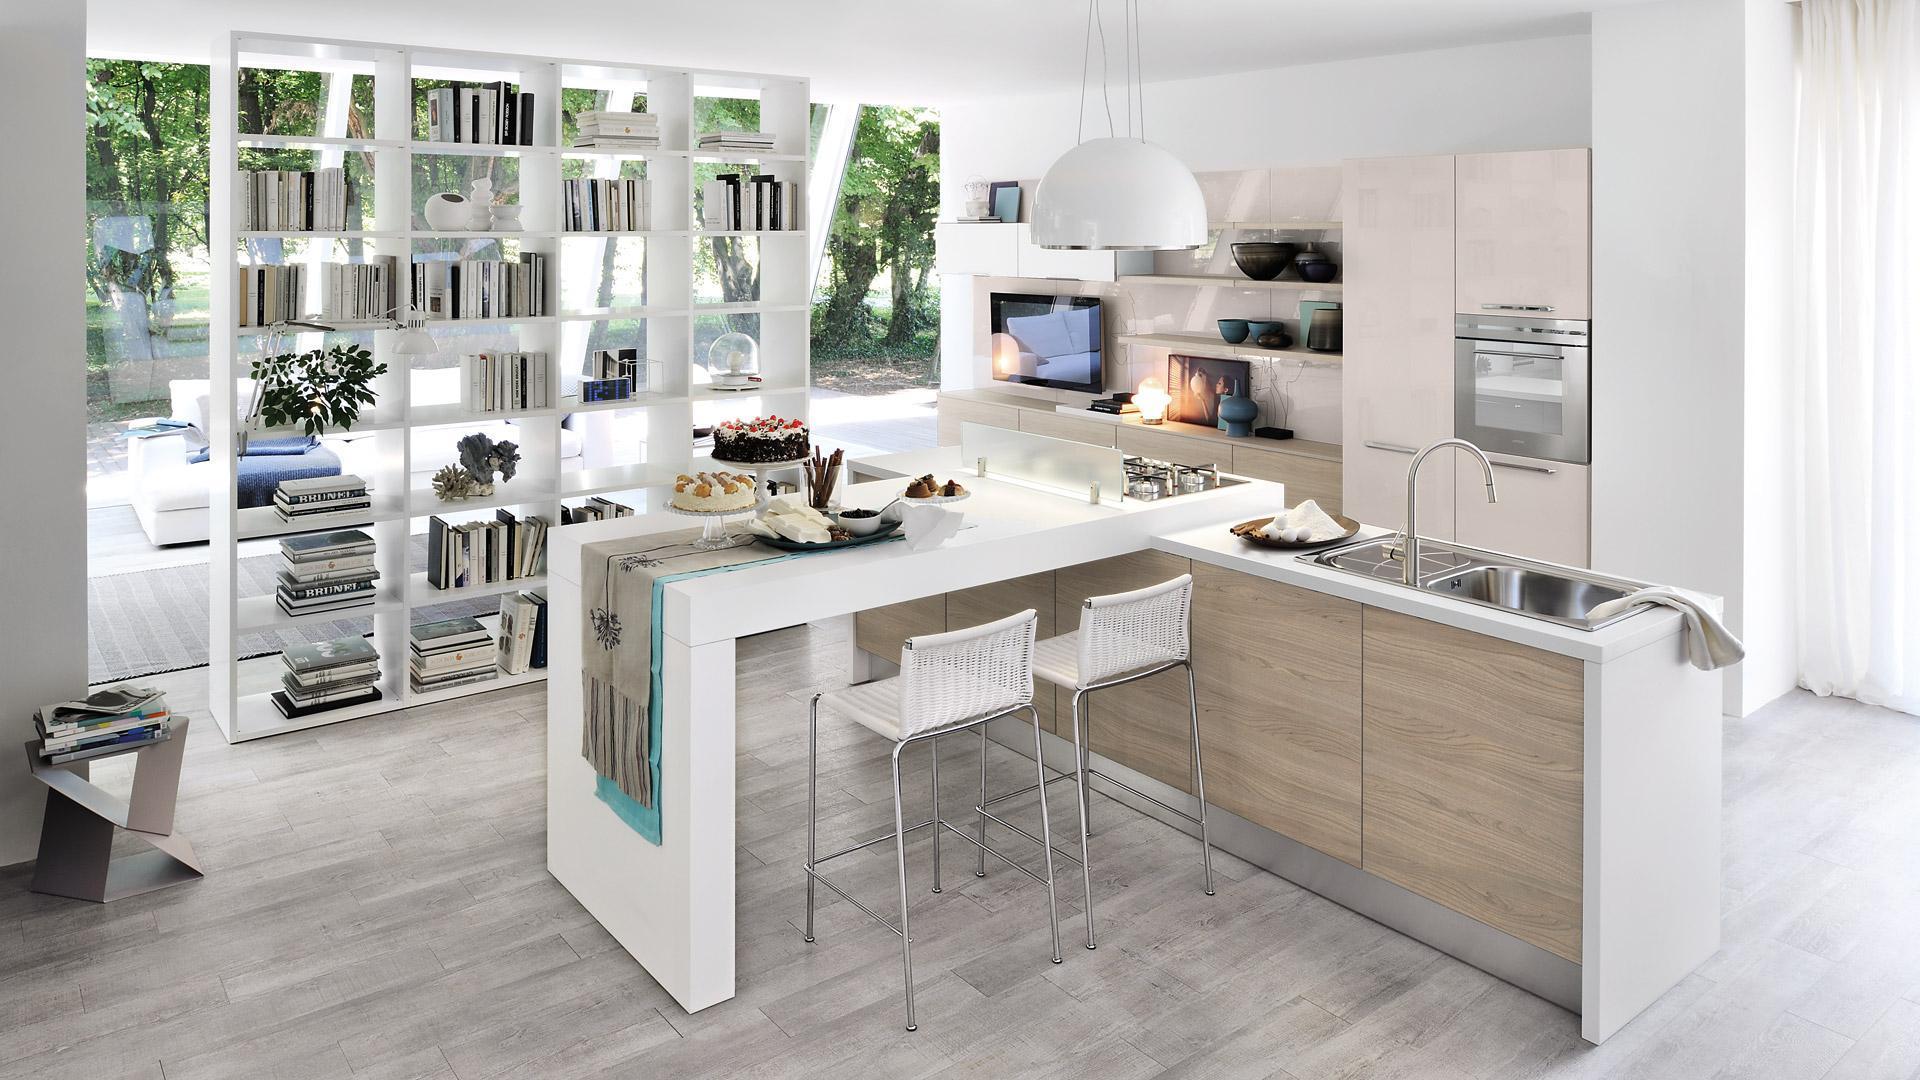 Cucine LUBE L'Aquila